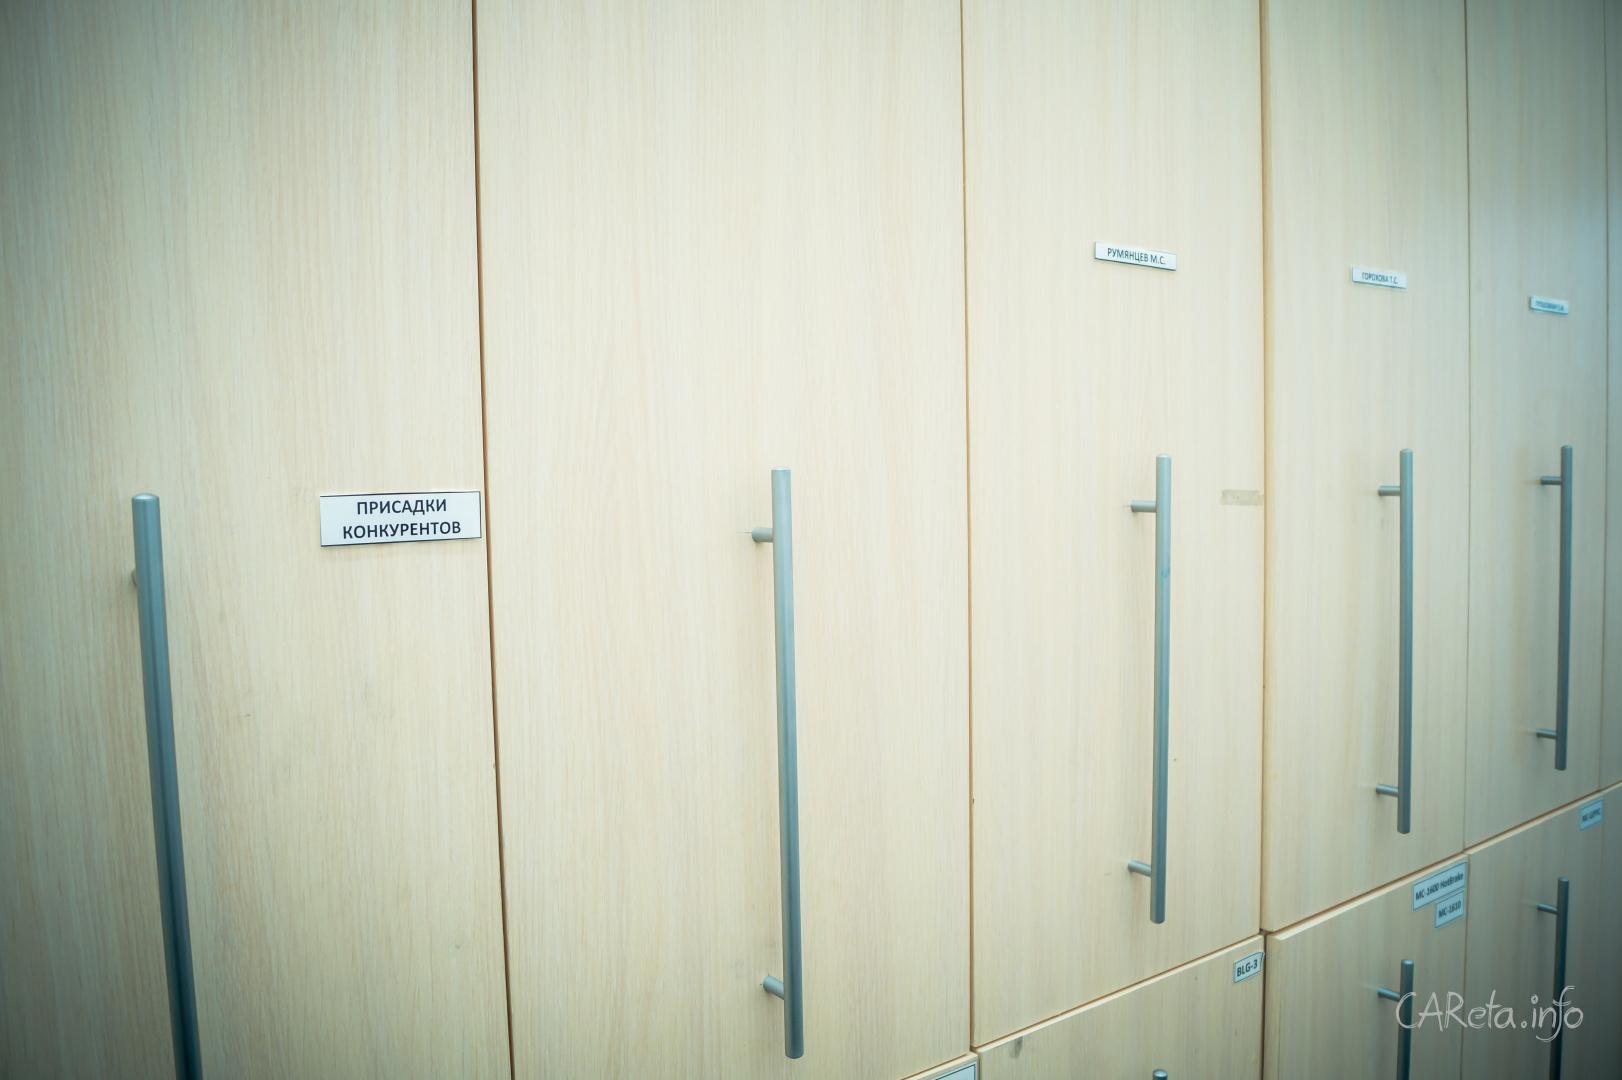 VMPAUTO: Lubricants for you | ВМПАвто: смазки для вас